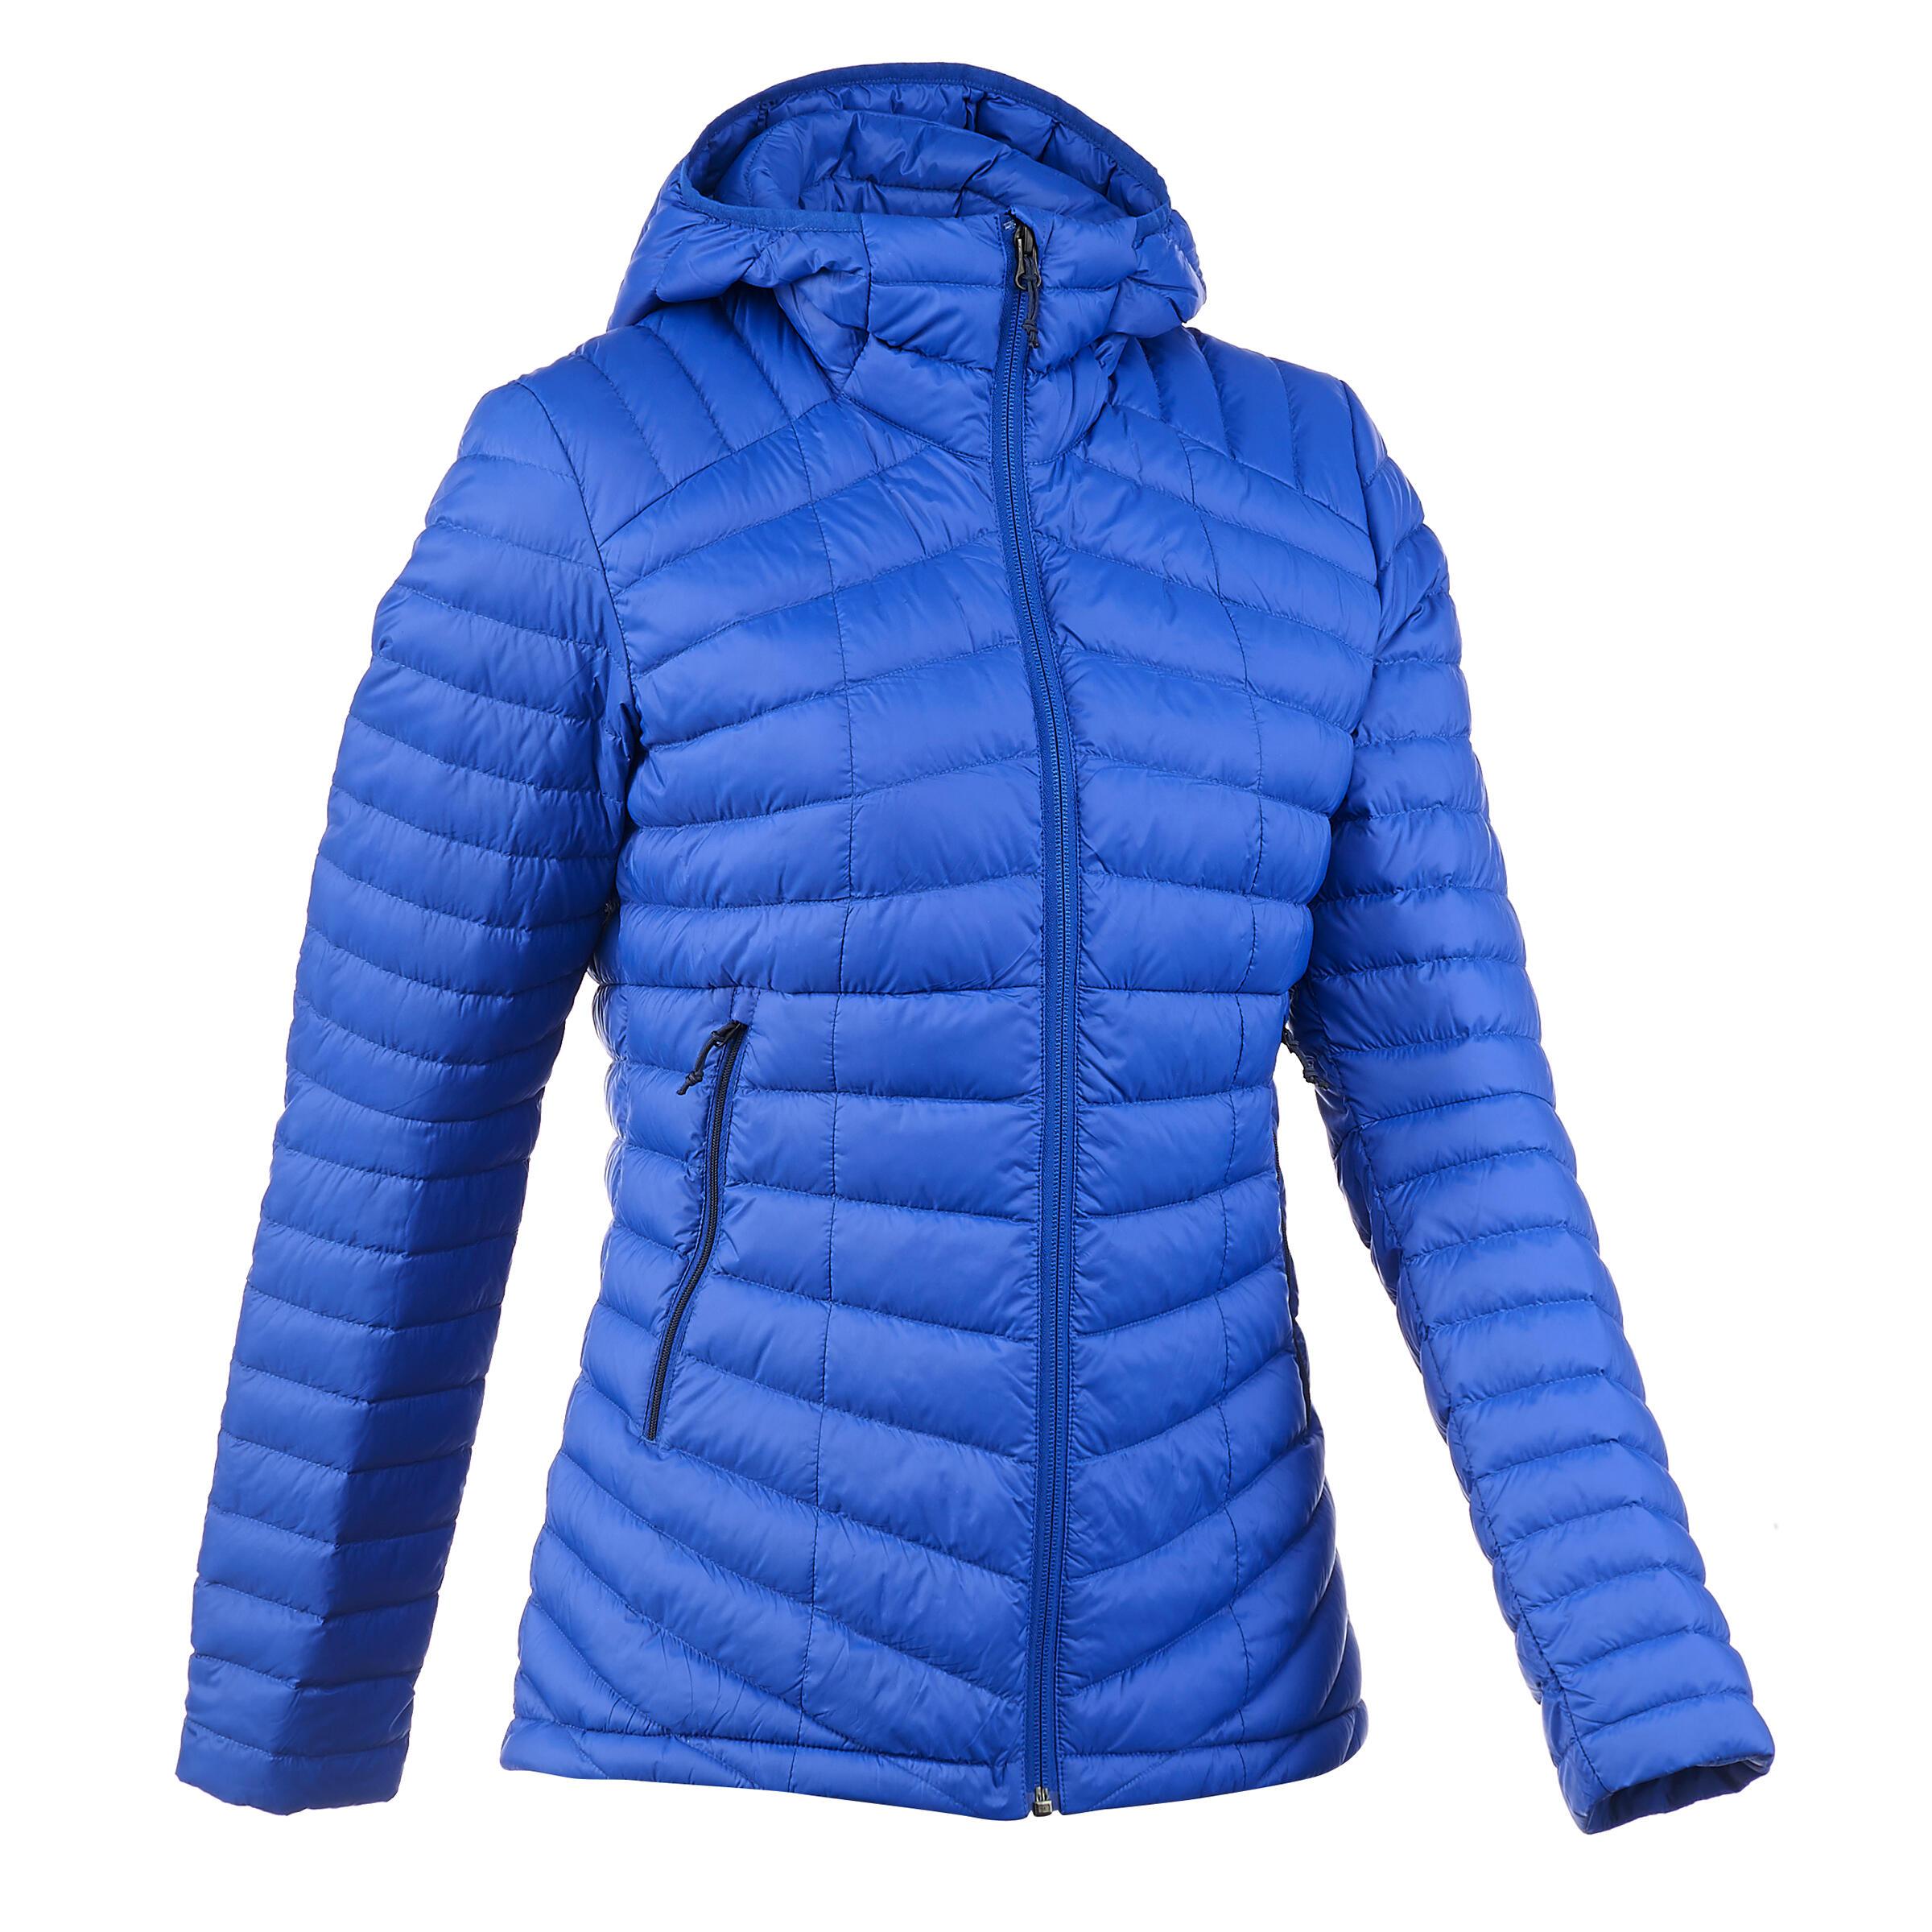 Marine Doudoune Bleu Trek500 Femme Trekking Montagne VUqSzMpG